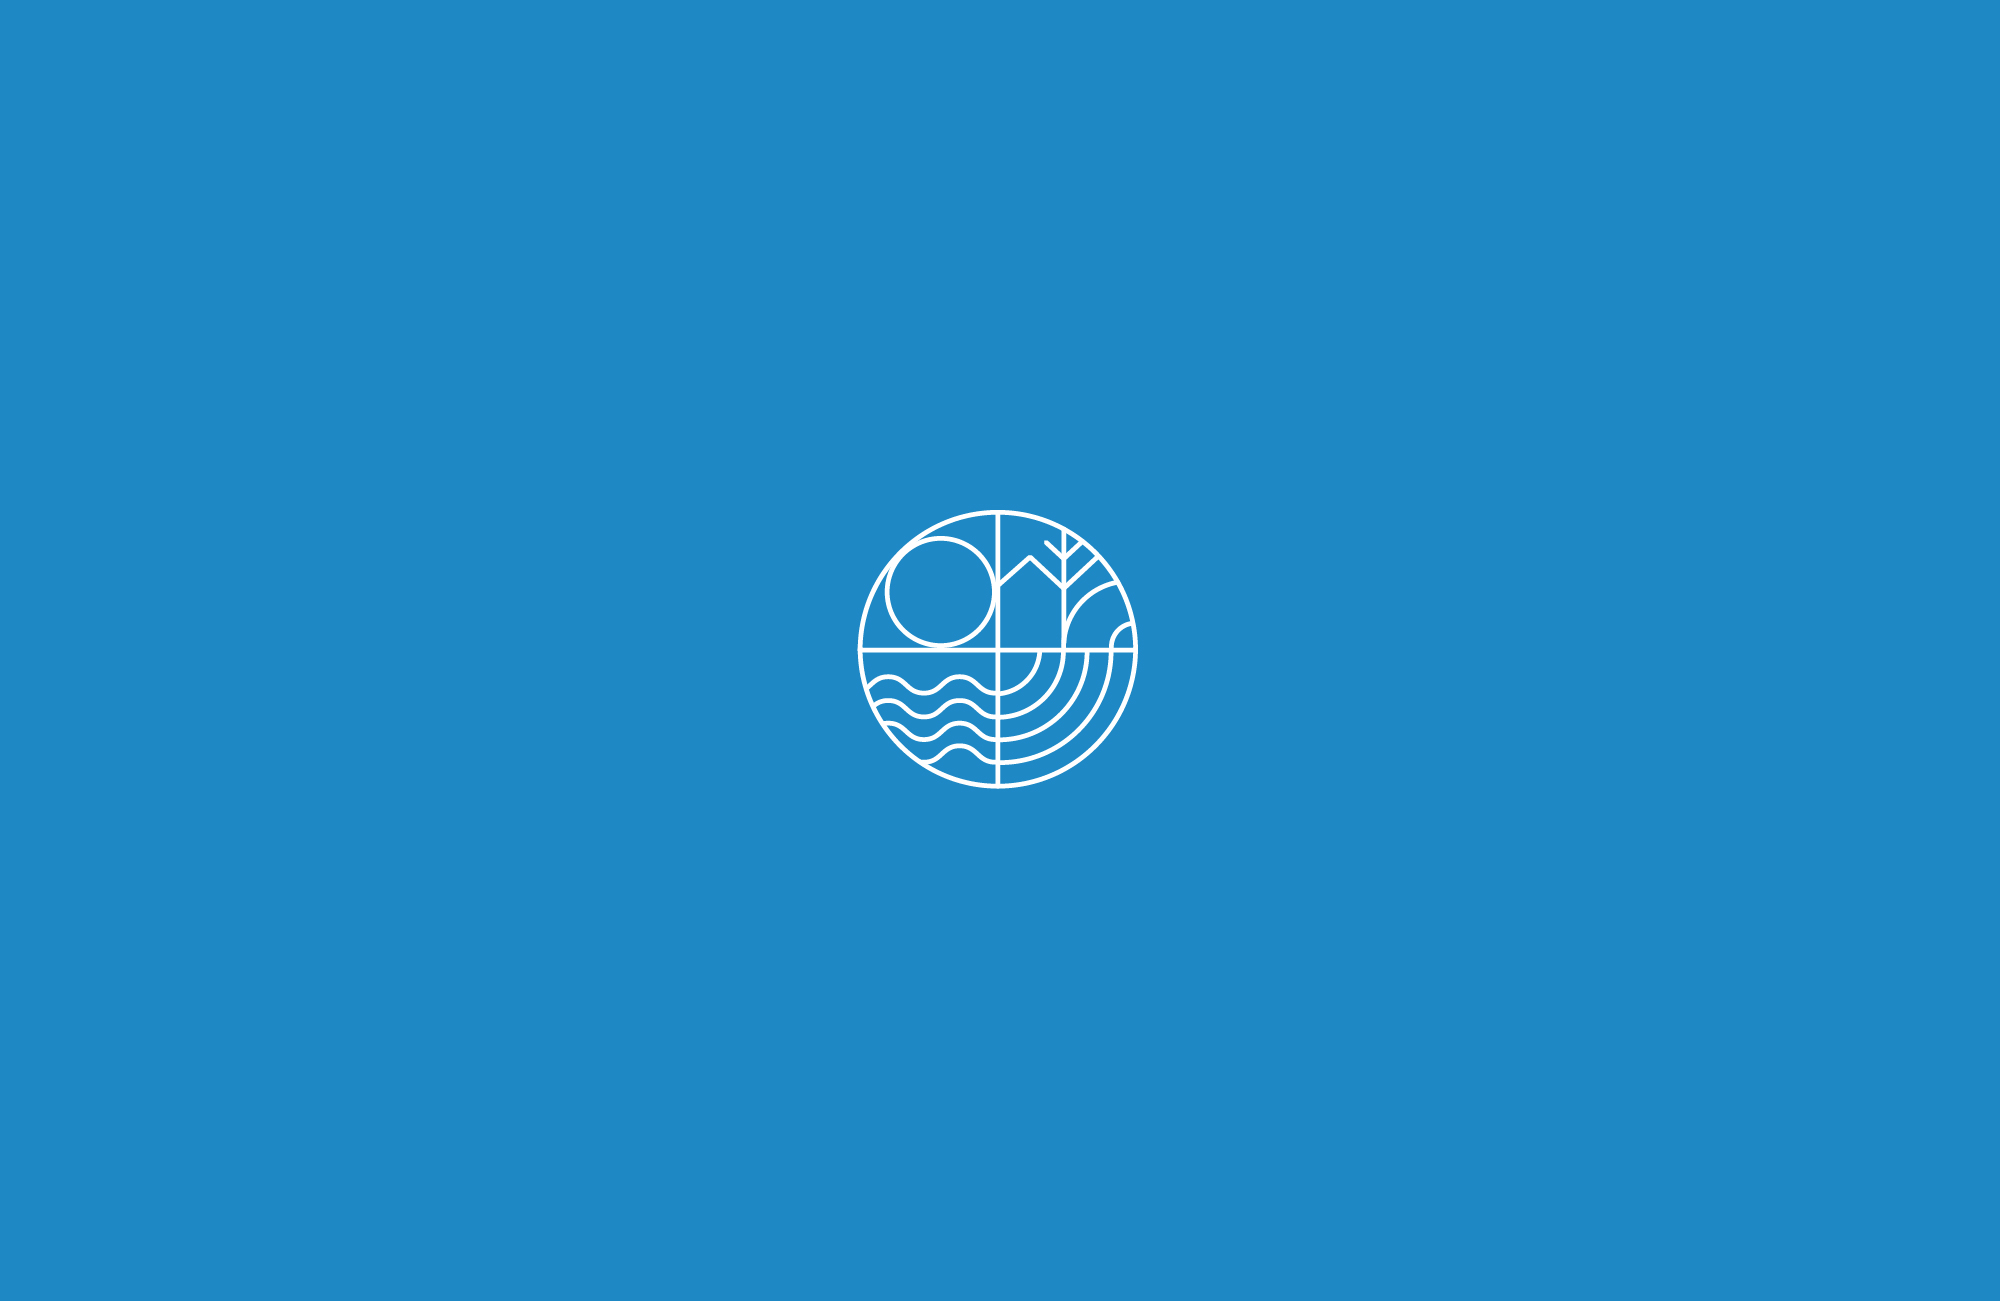 viscayawagner_select_common-earth_-01.jpg